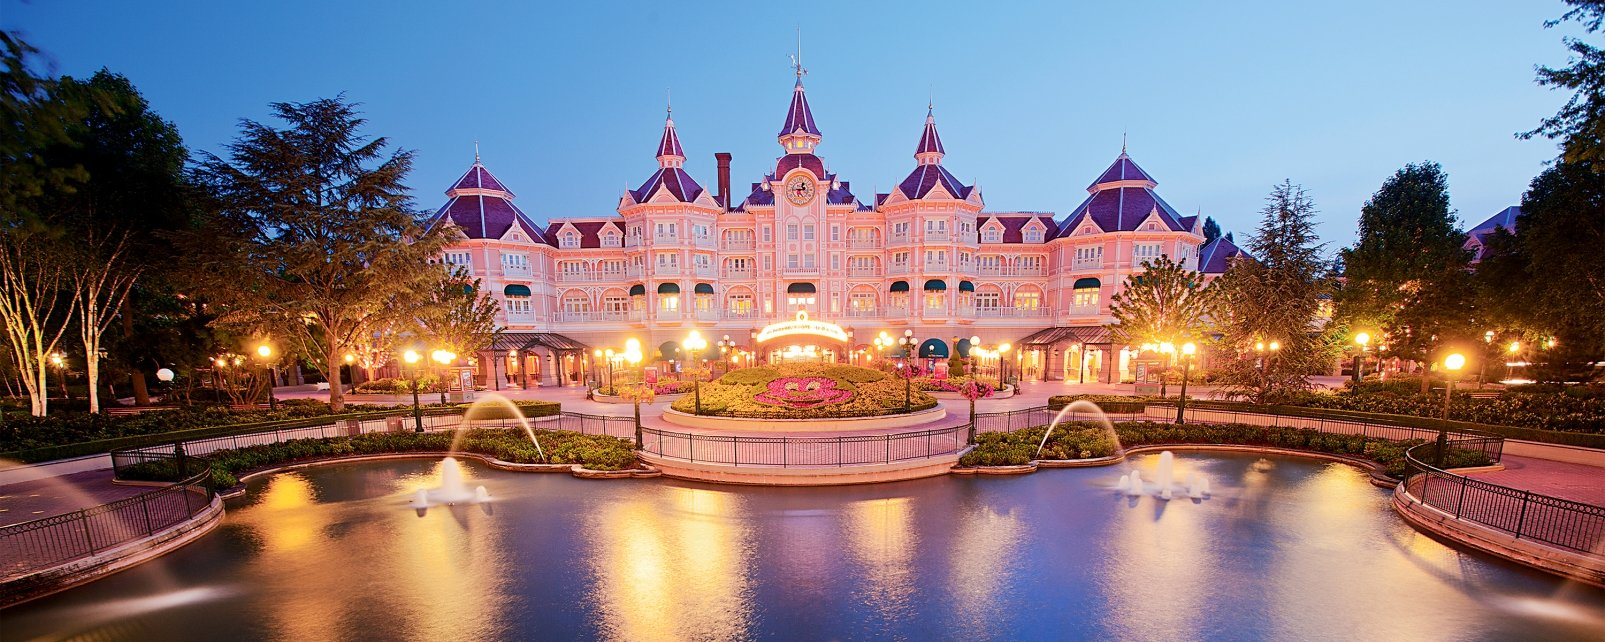 Hotel Disneyland Hôtel